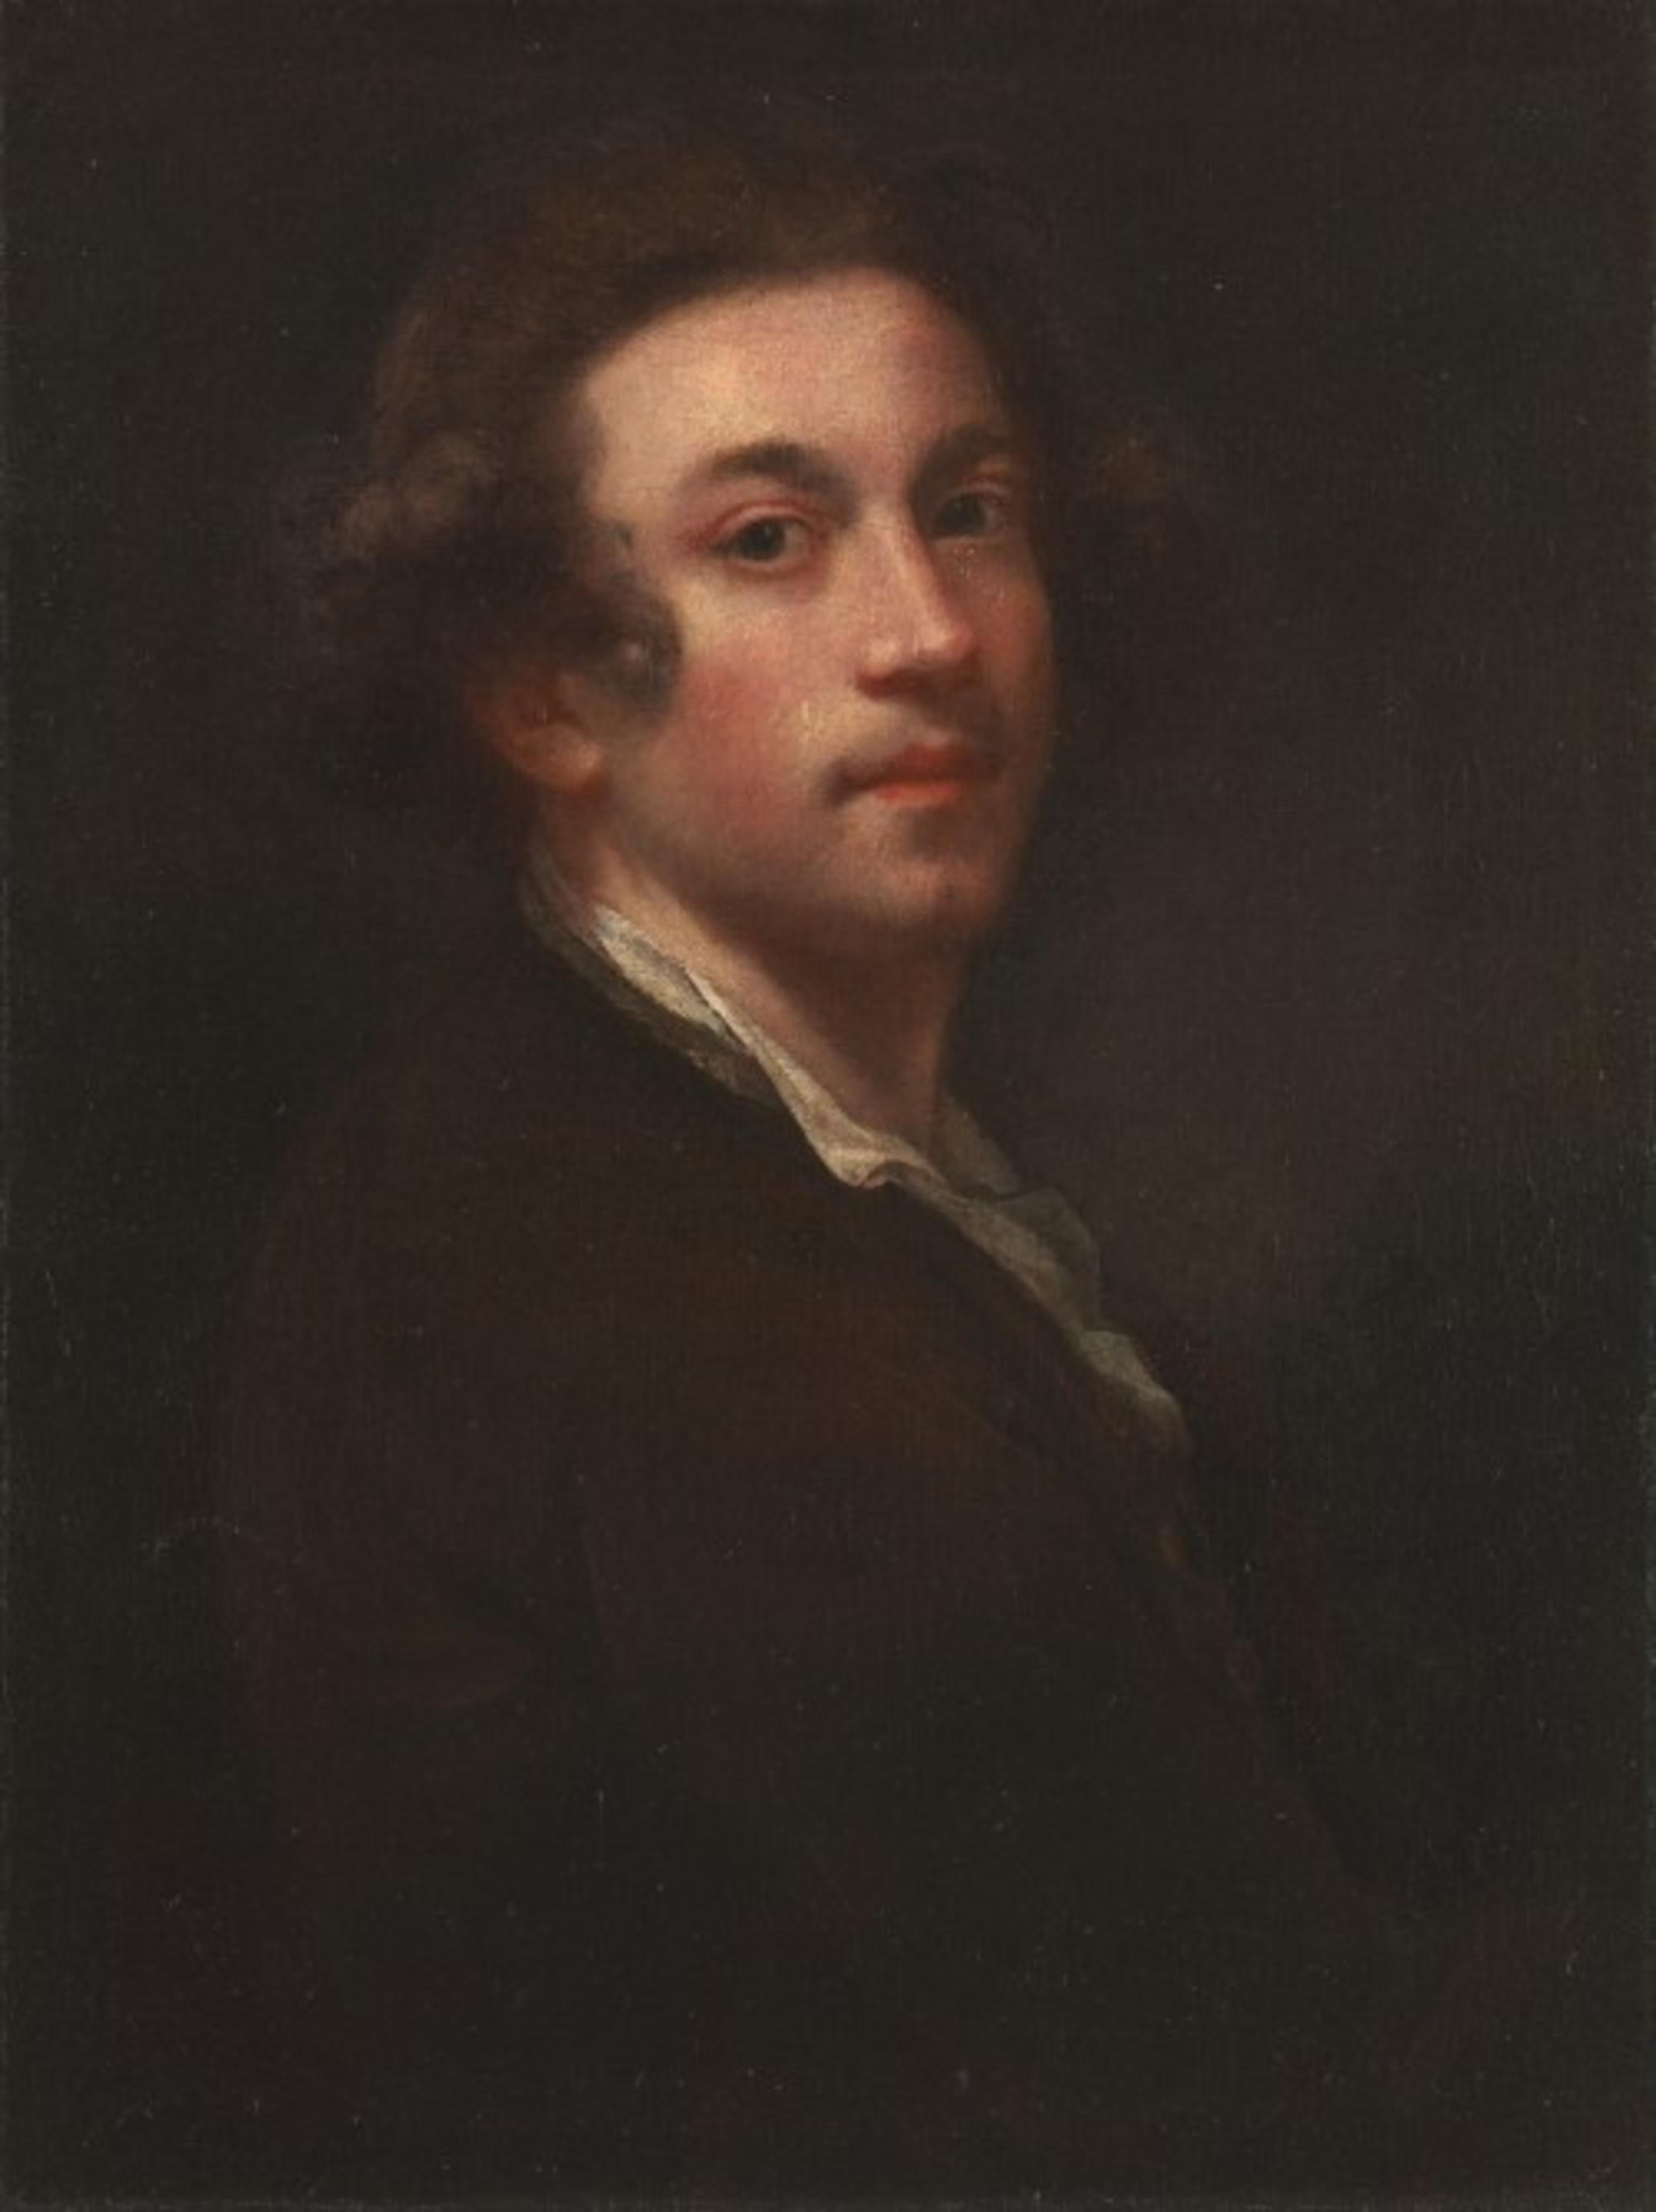 Sir_Joshua_Reynolds_-_Self-Portrait_-_Google_Art_Project_2315517.jpg